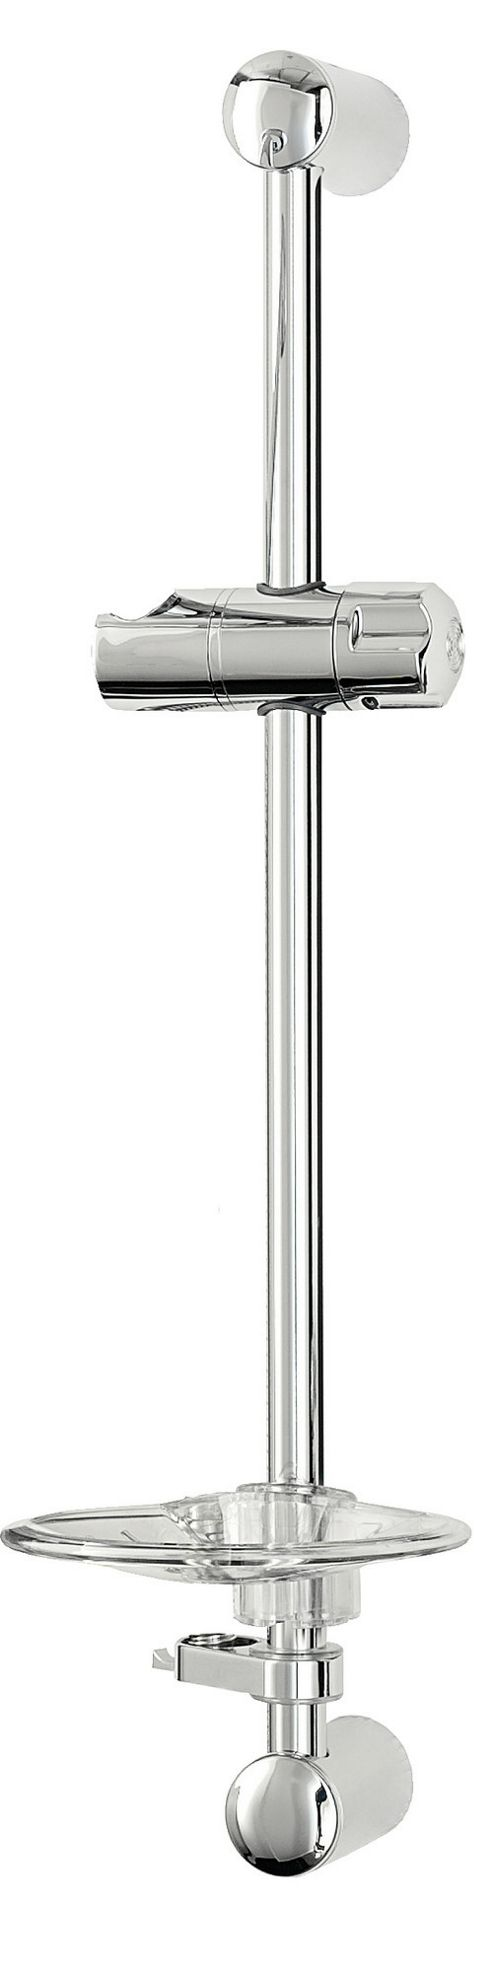 Triton Showers Aaron 1 Position Shower Kit - Chrome